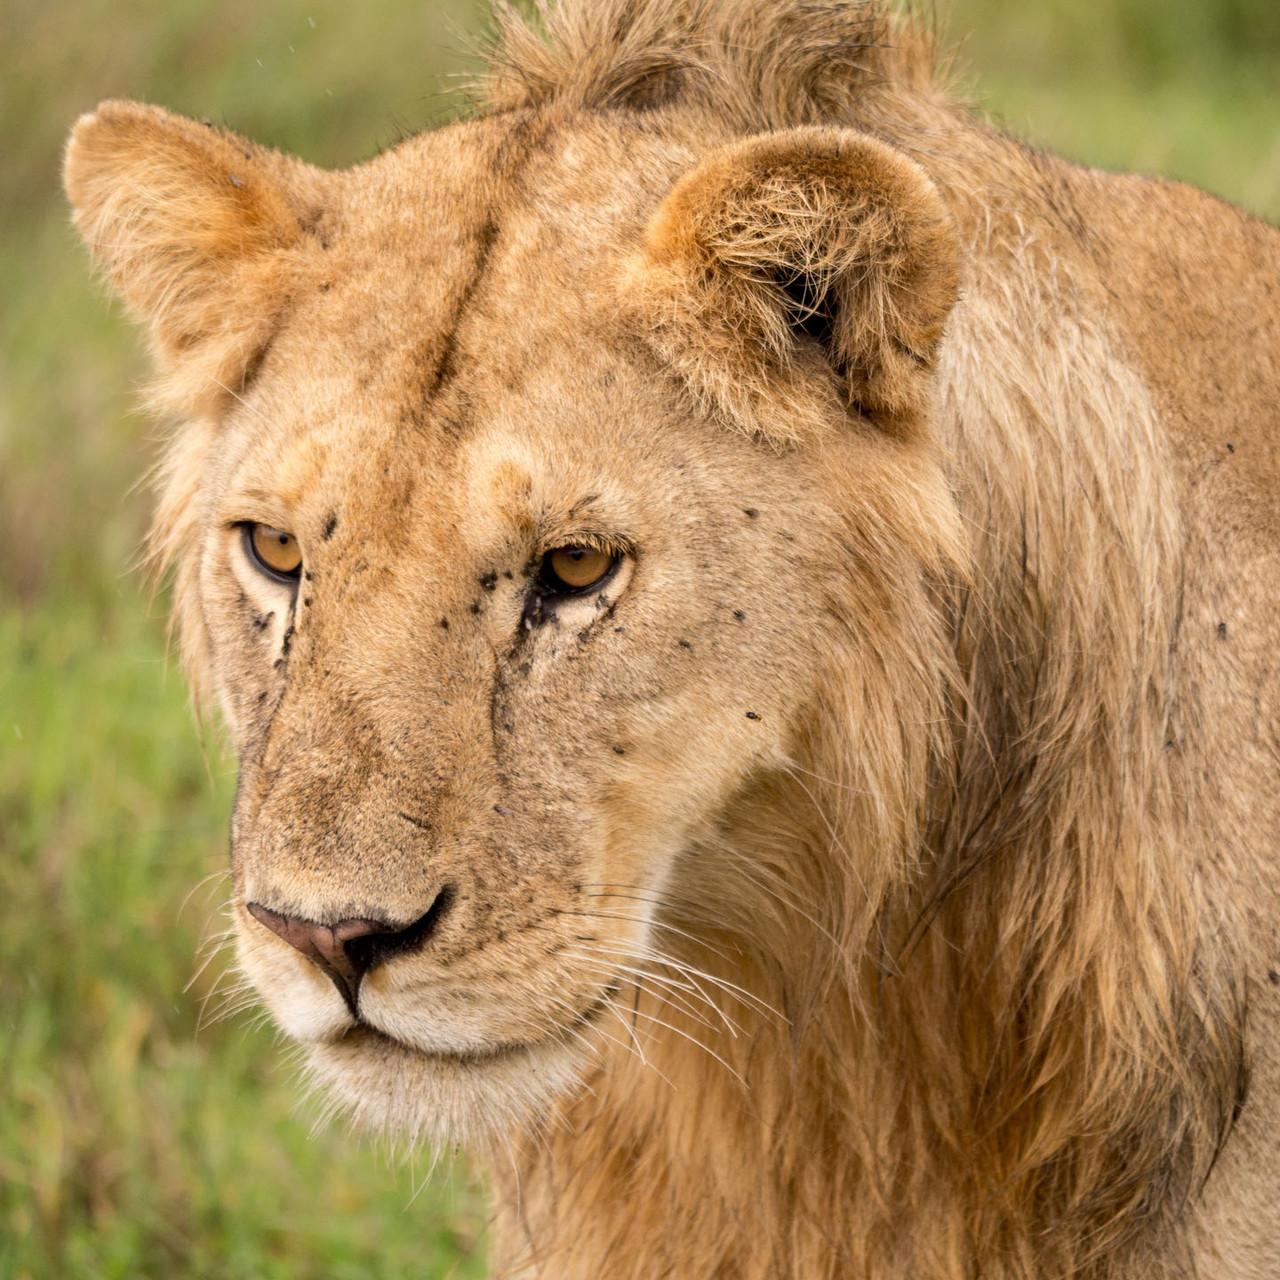 Lion [Serengeti, Tanzania, 2015]